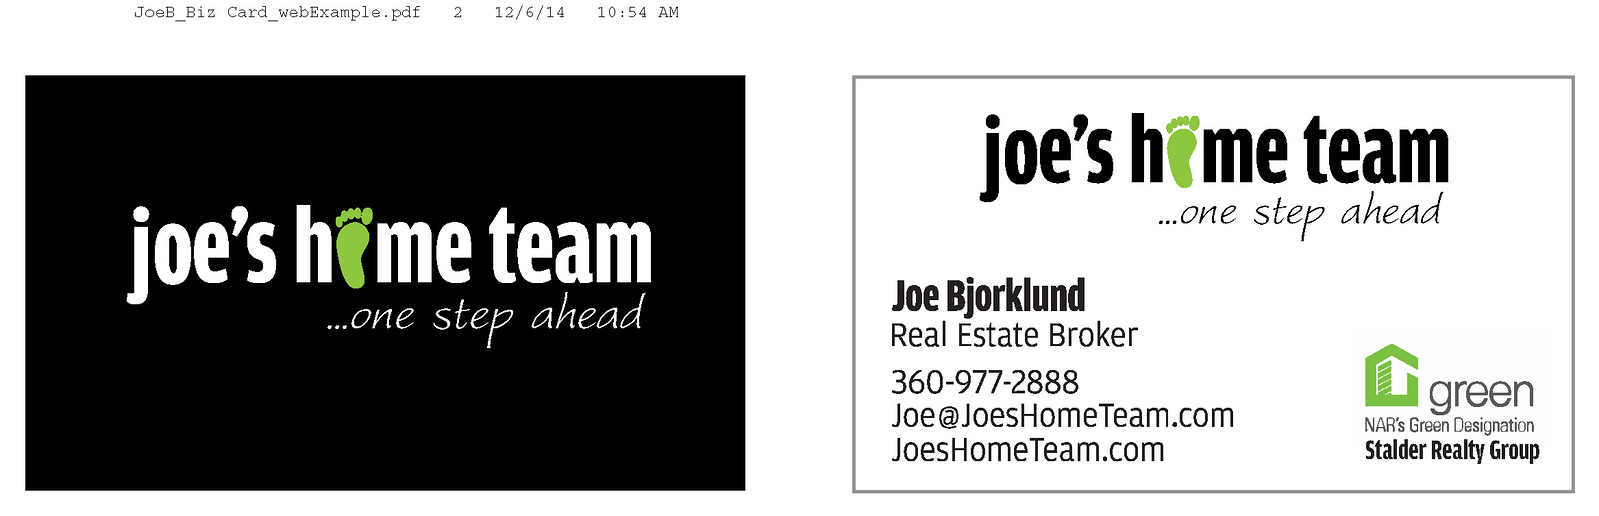 Joe'sHomeTeam_JodiTripp.jpg